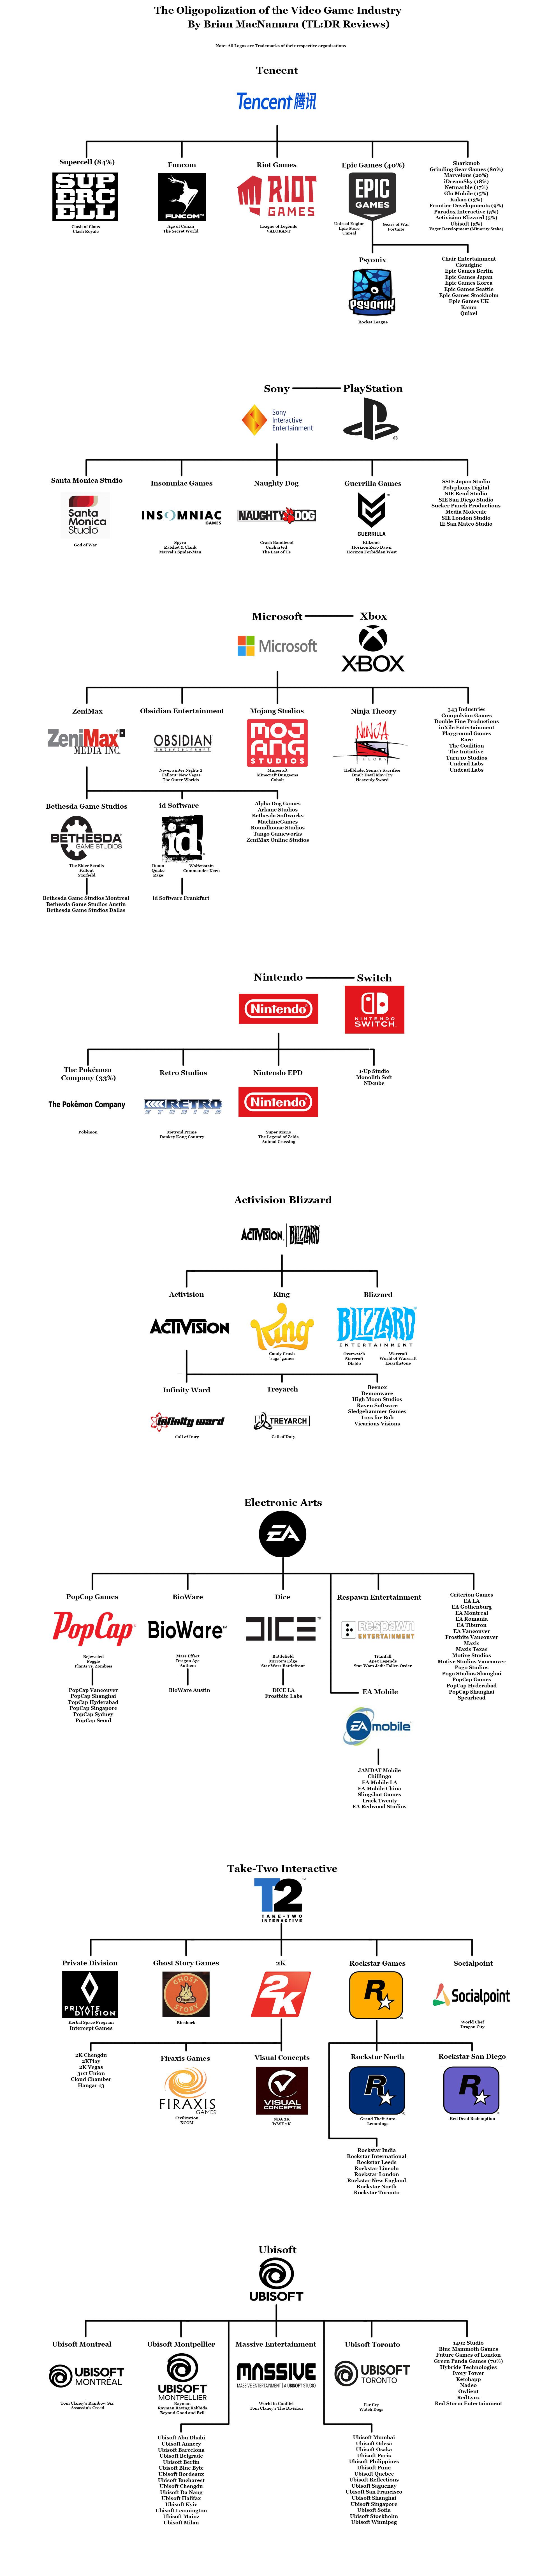 The Oligopolization of the Video Game Industry. Image Credit: Brian MacNamara. Image Logos Credit: Their Respective Companies.